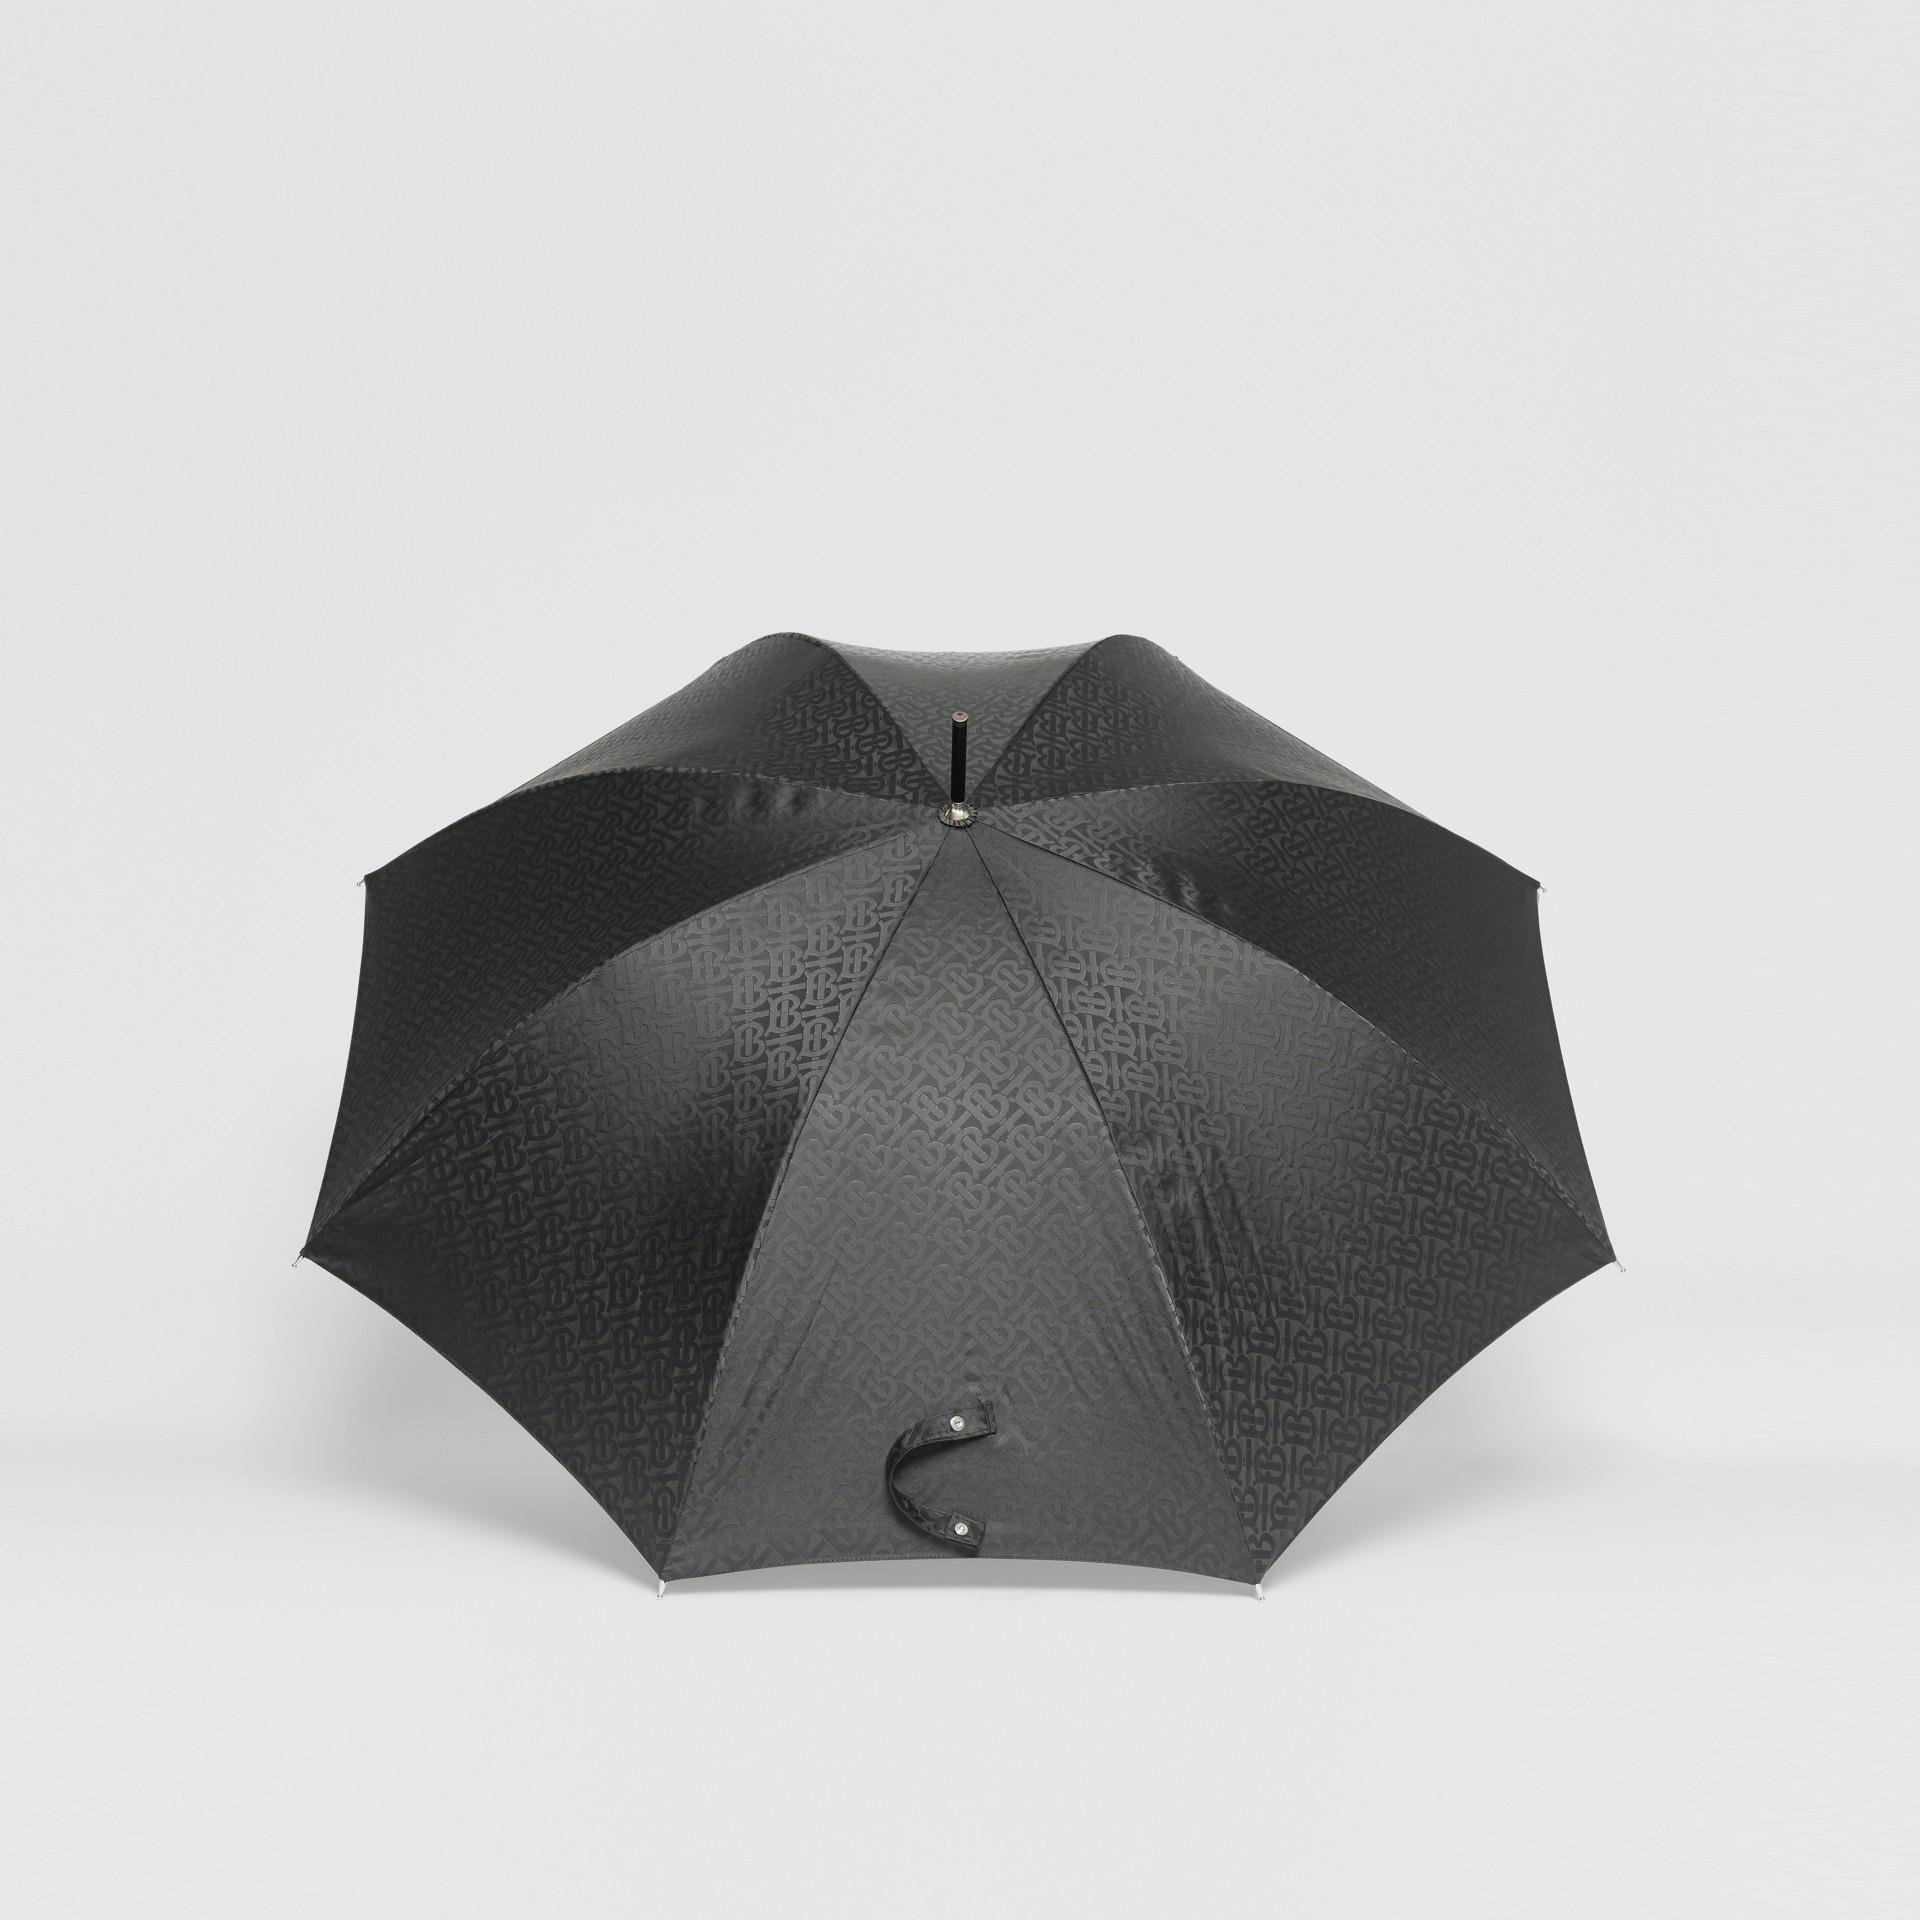 Monogram Print Umbrella in Black | Burberry United States - gallery image 4